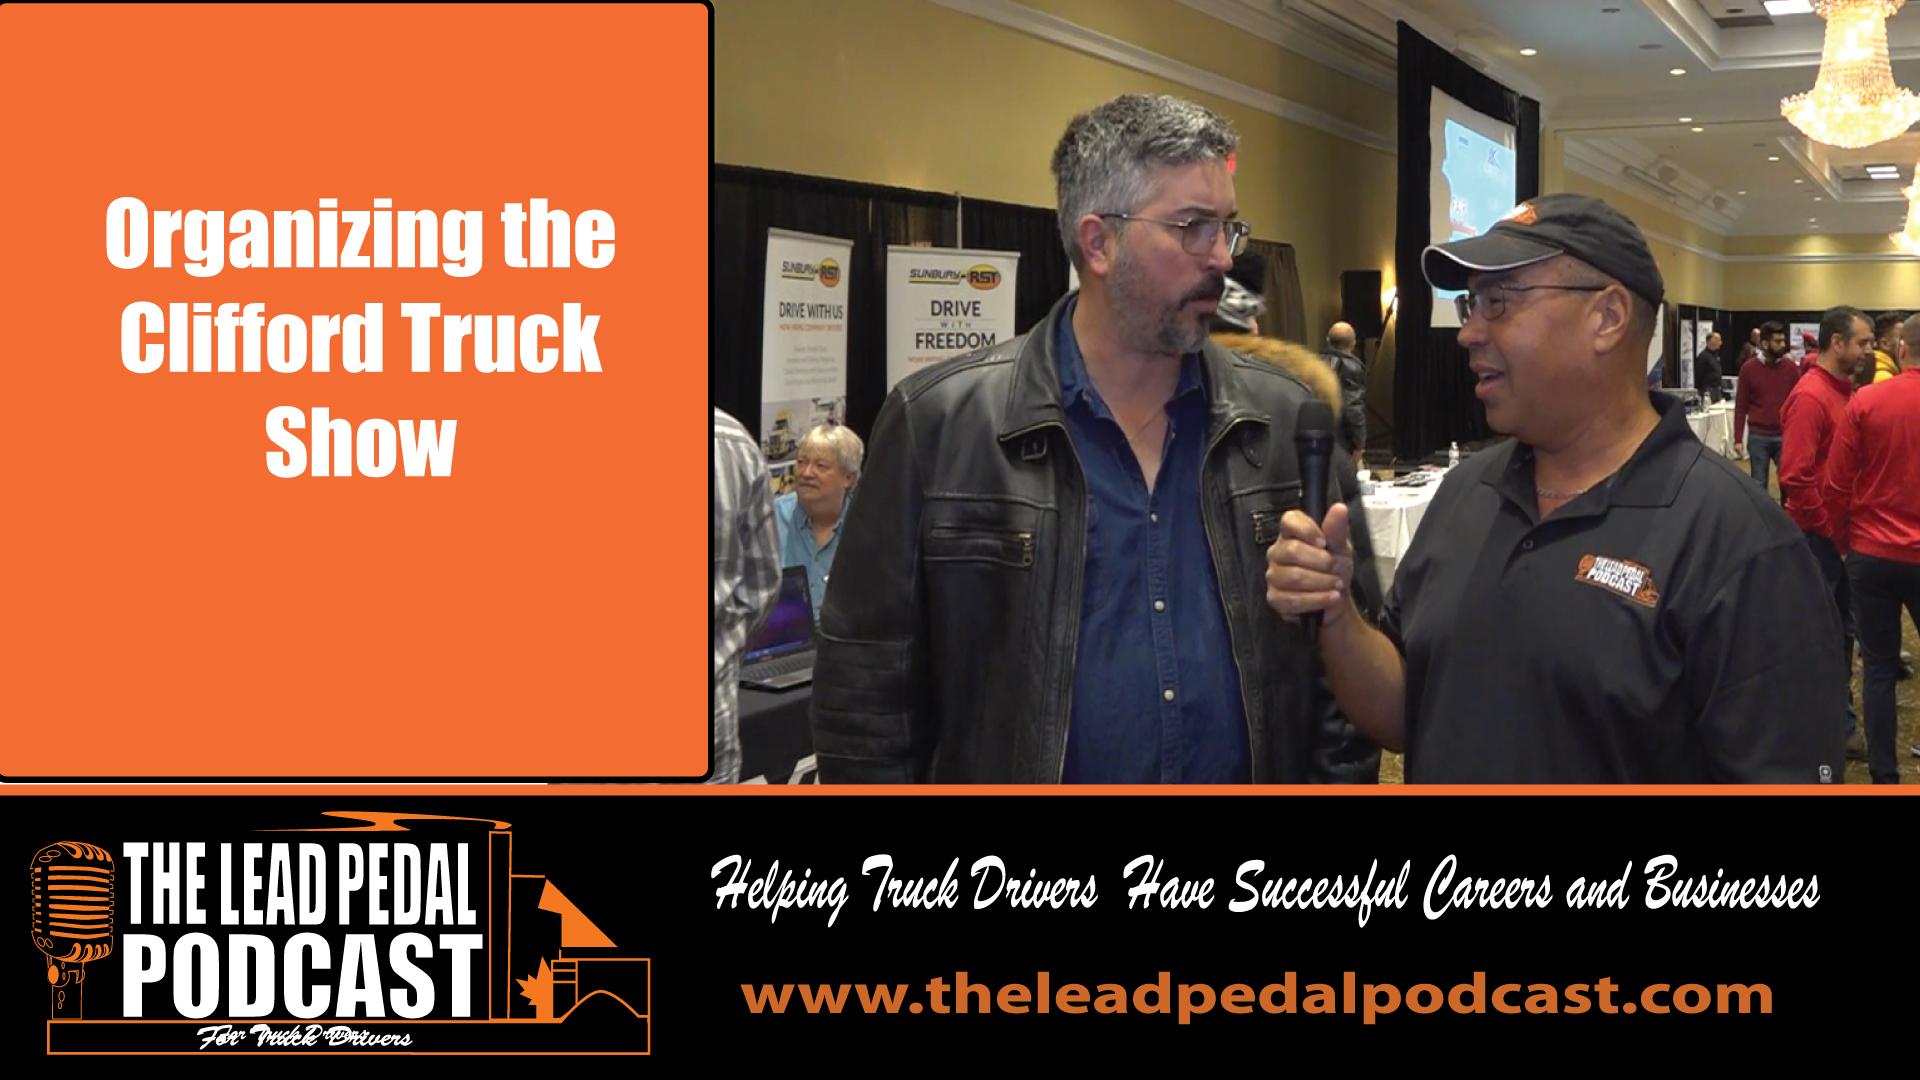 Clifford truck show